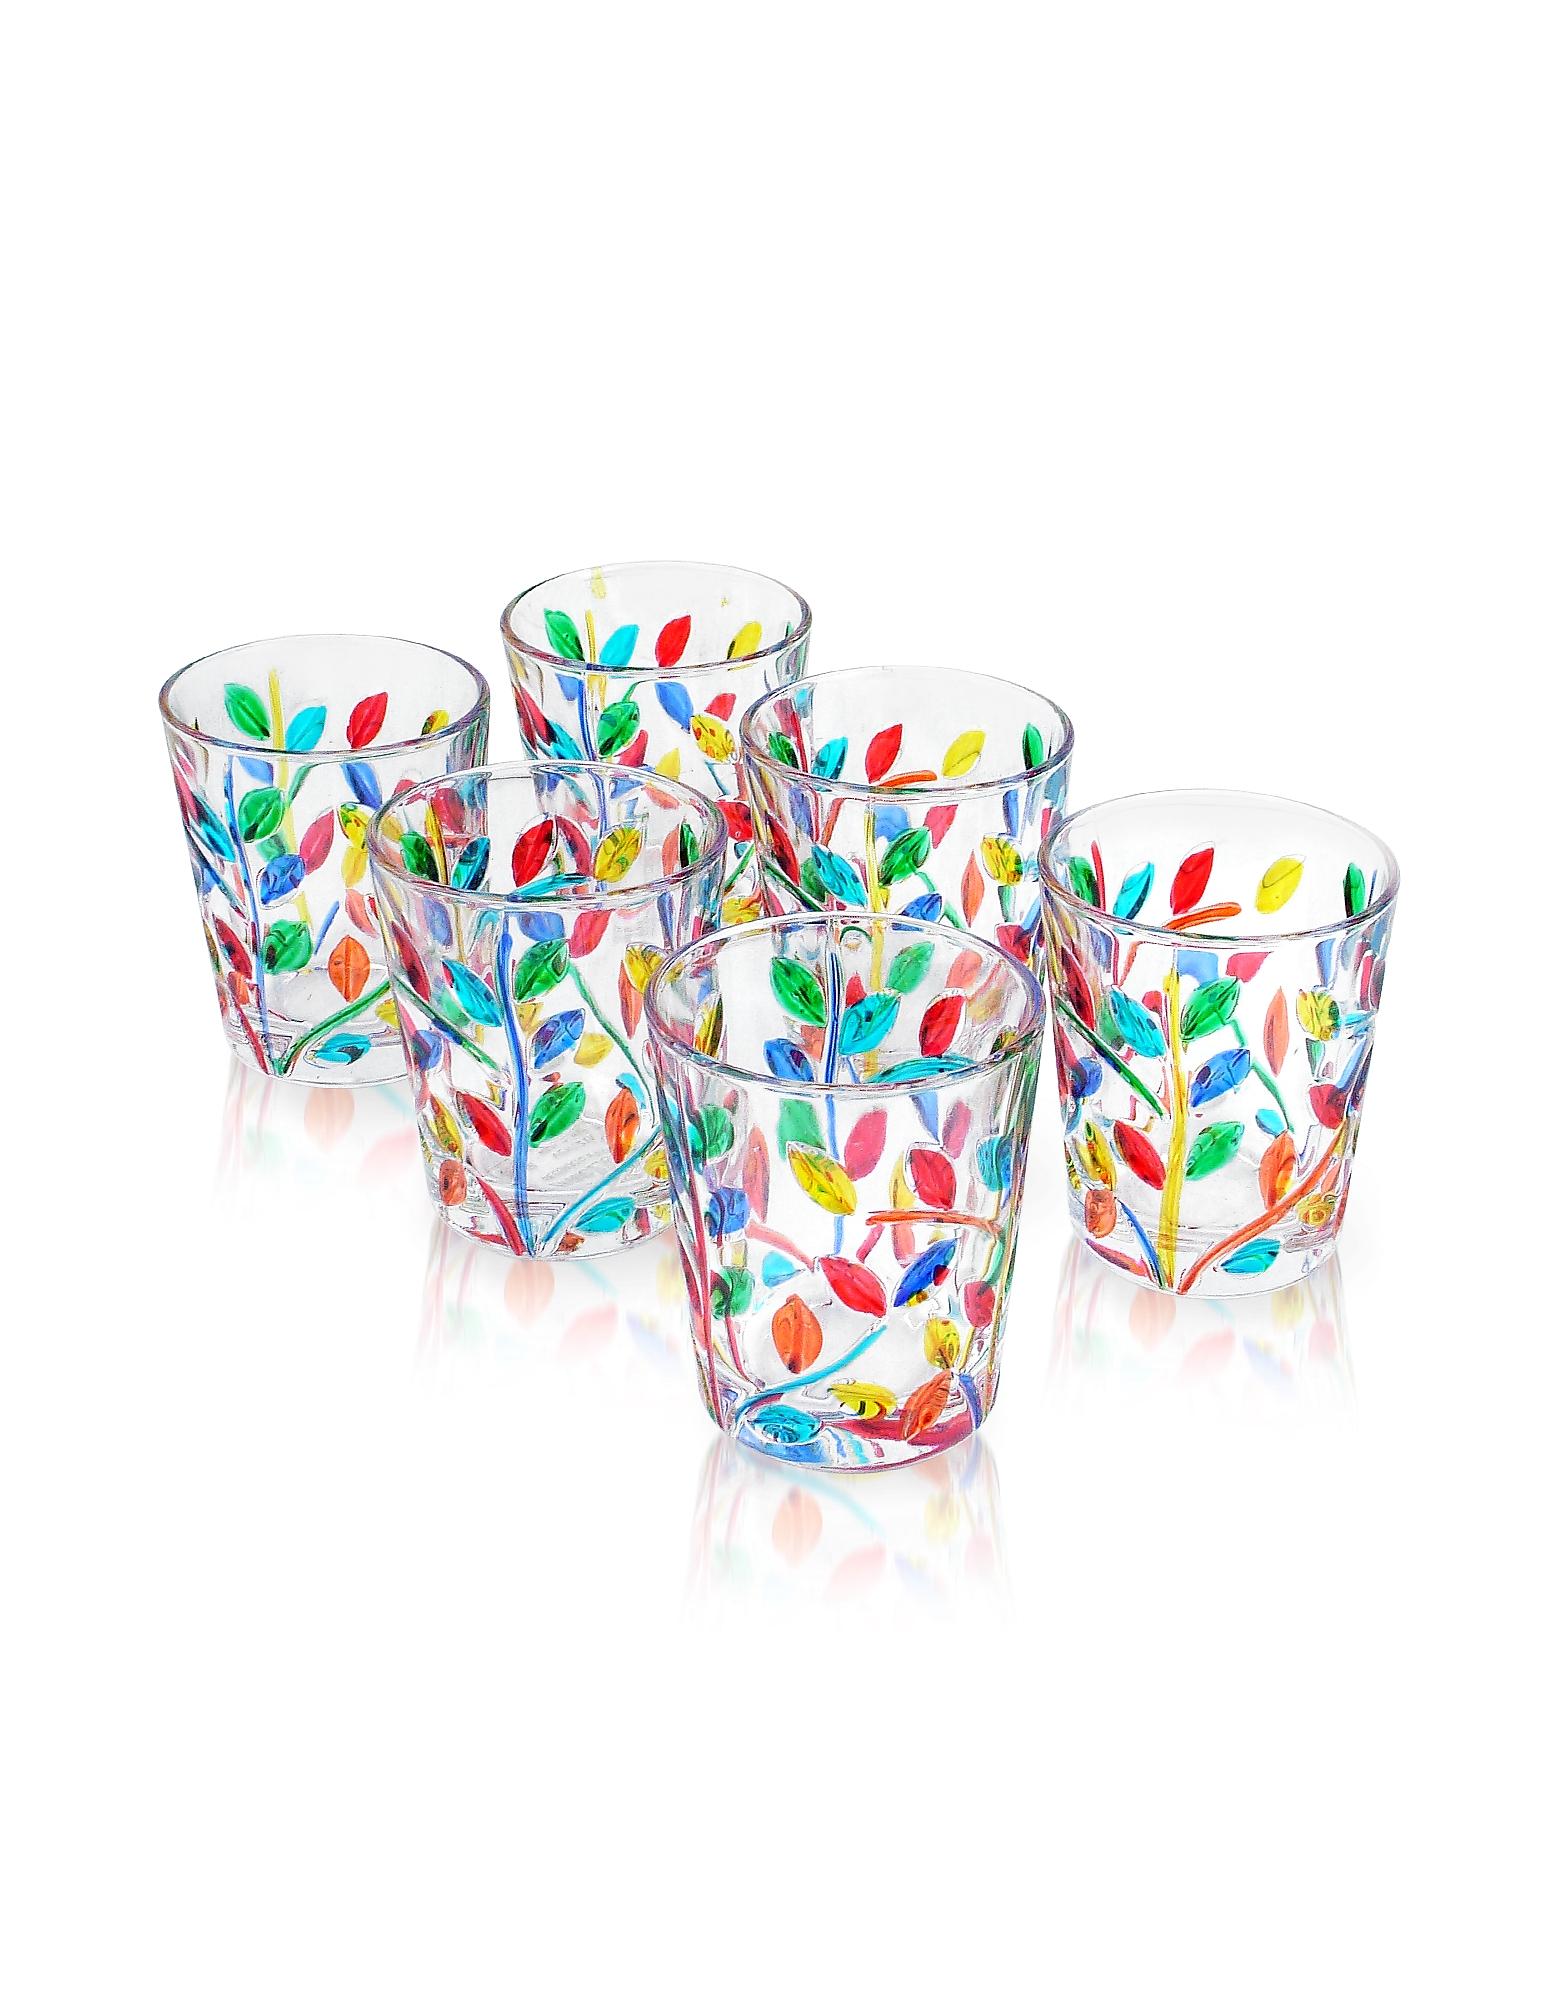 Sospiri - Multicolor Hand Decorated Murano Shot Glass Set of Six от Forzieri.com INT